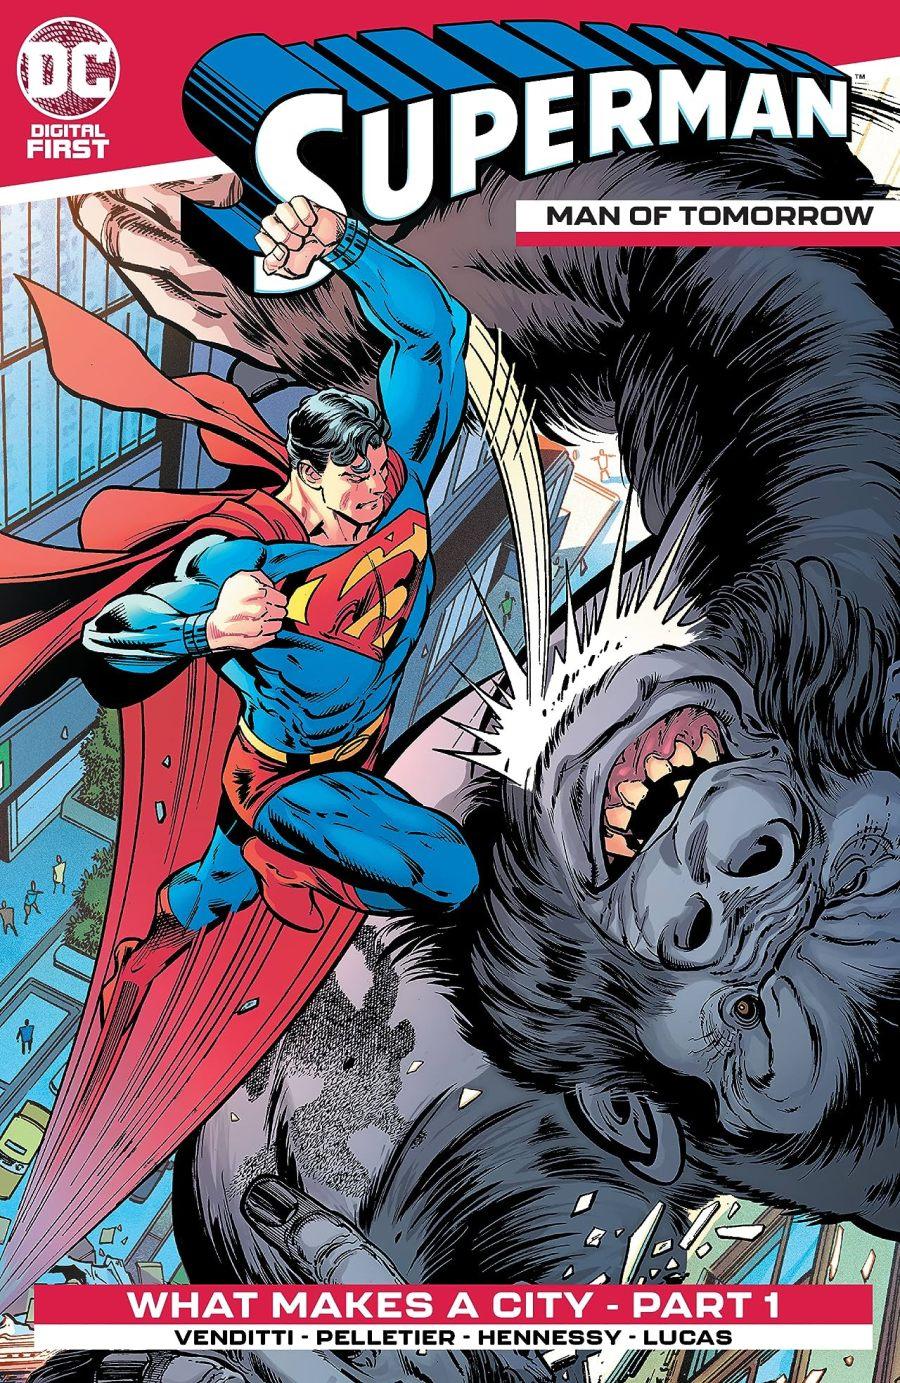 Superman: Man of Tomorrow #5 - DC Entertainment